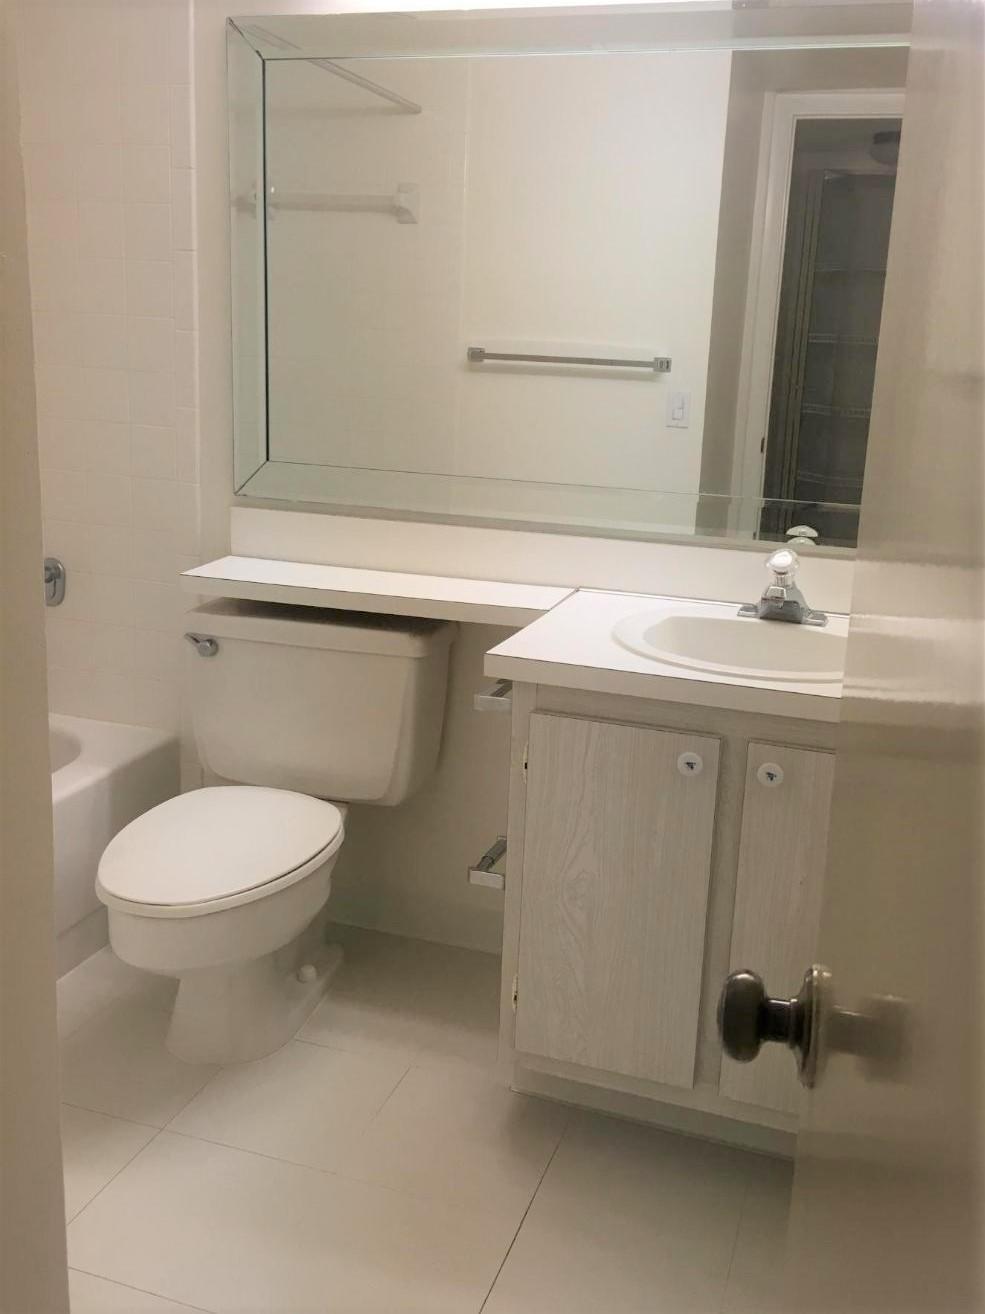 118 Lake Pine Circle, Greenacres, Florida 33463, 2 Bedrooms Bedrooms, ,2 BathroomsBathrooms,Residential,for Rent,Pine Ridge South I,Lake Pine,RX-10638888, , , ,for Rent